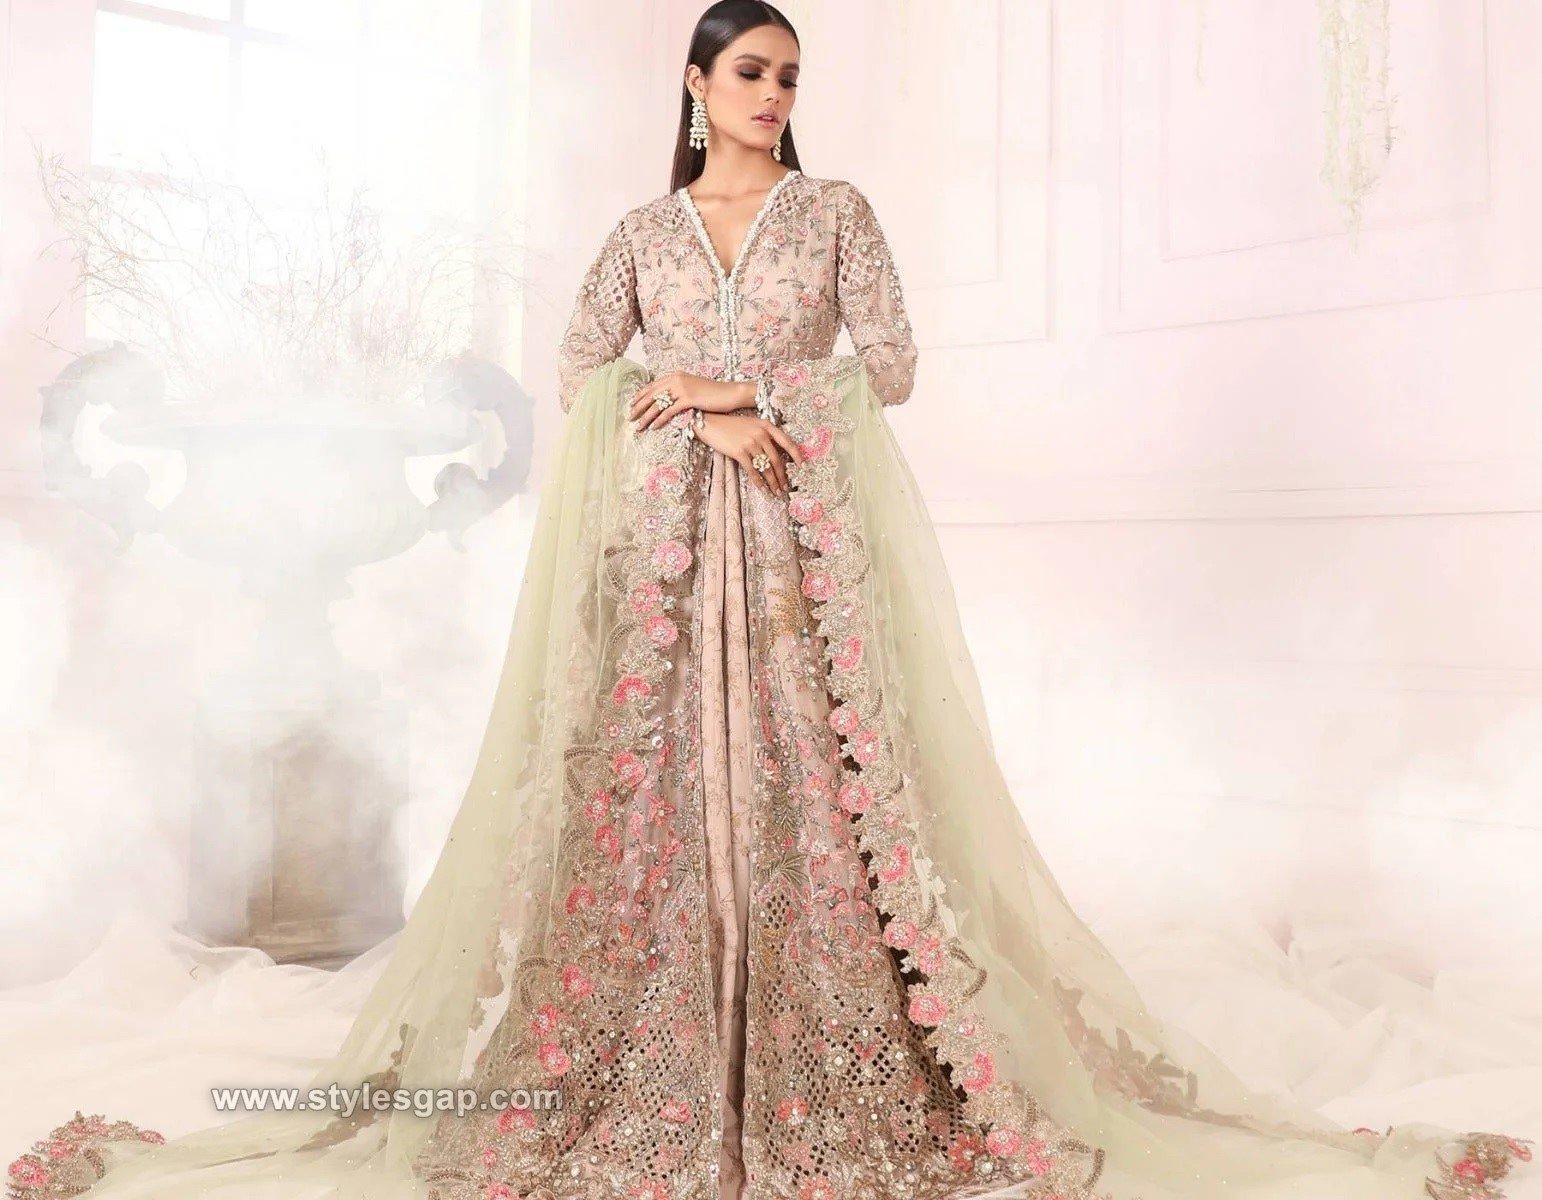 Best & Popular Top Pakistani Bridal Dress Brands & Designs